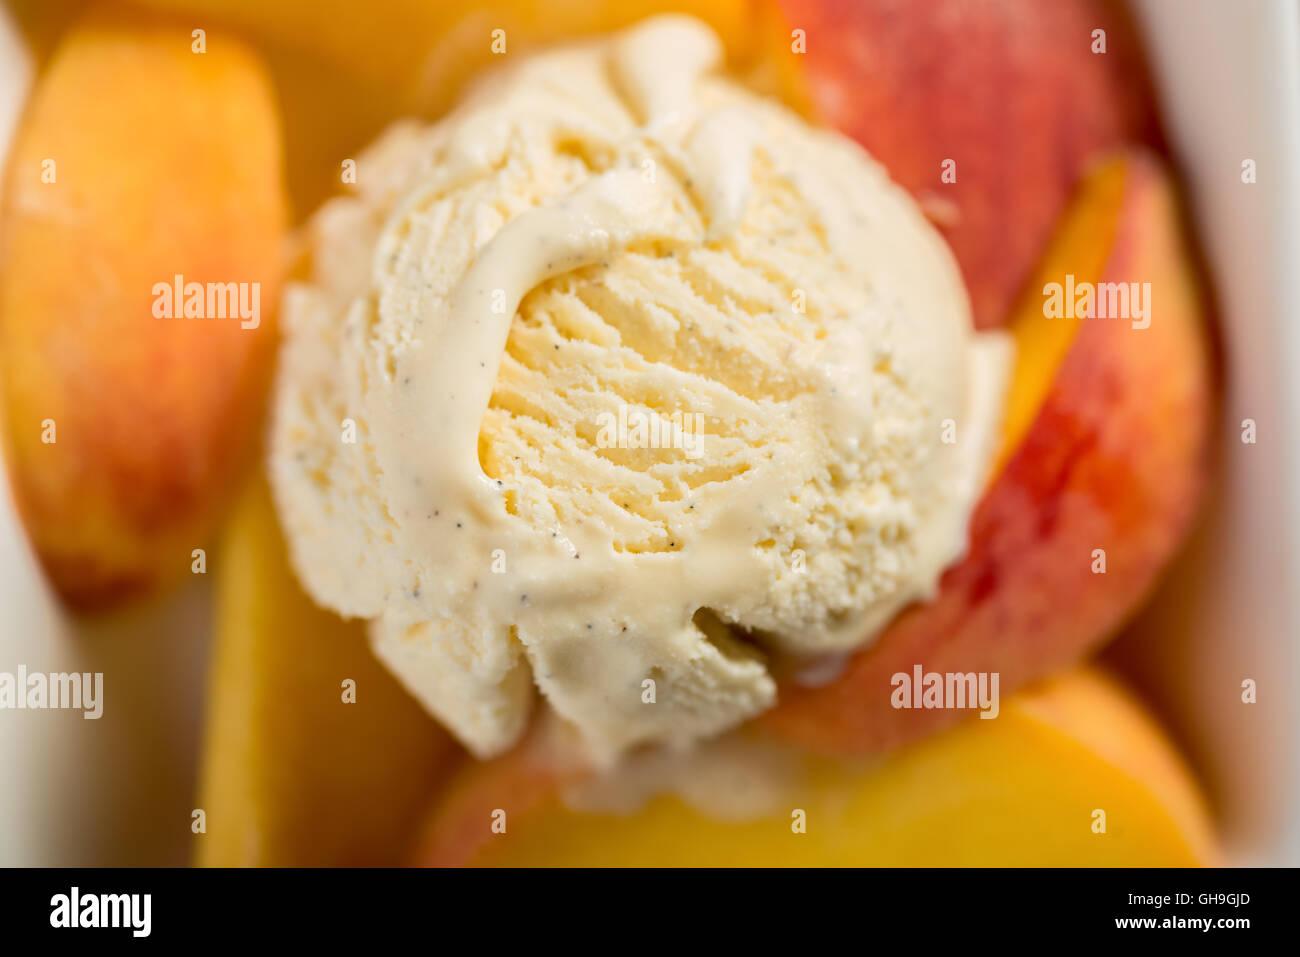 Vanilla ice cream and fresh peaches - Stock Image